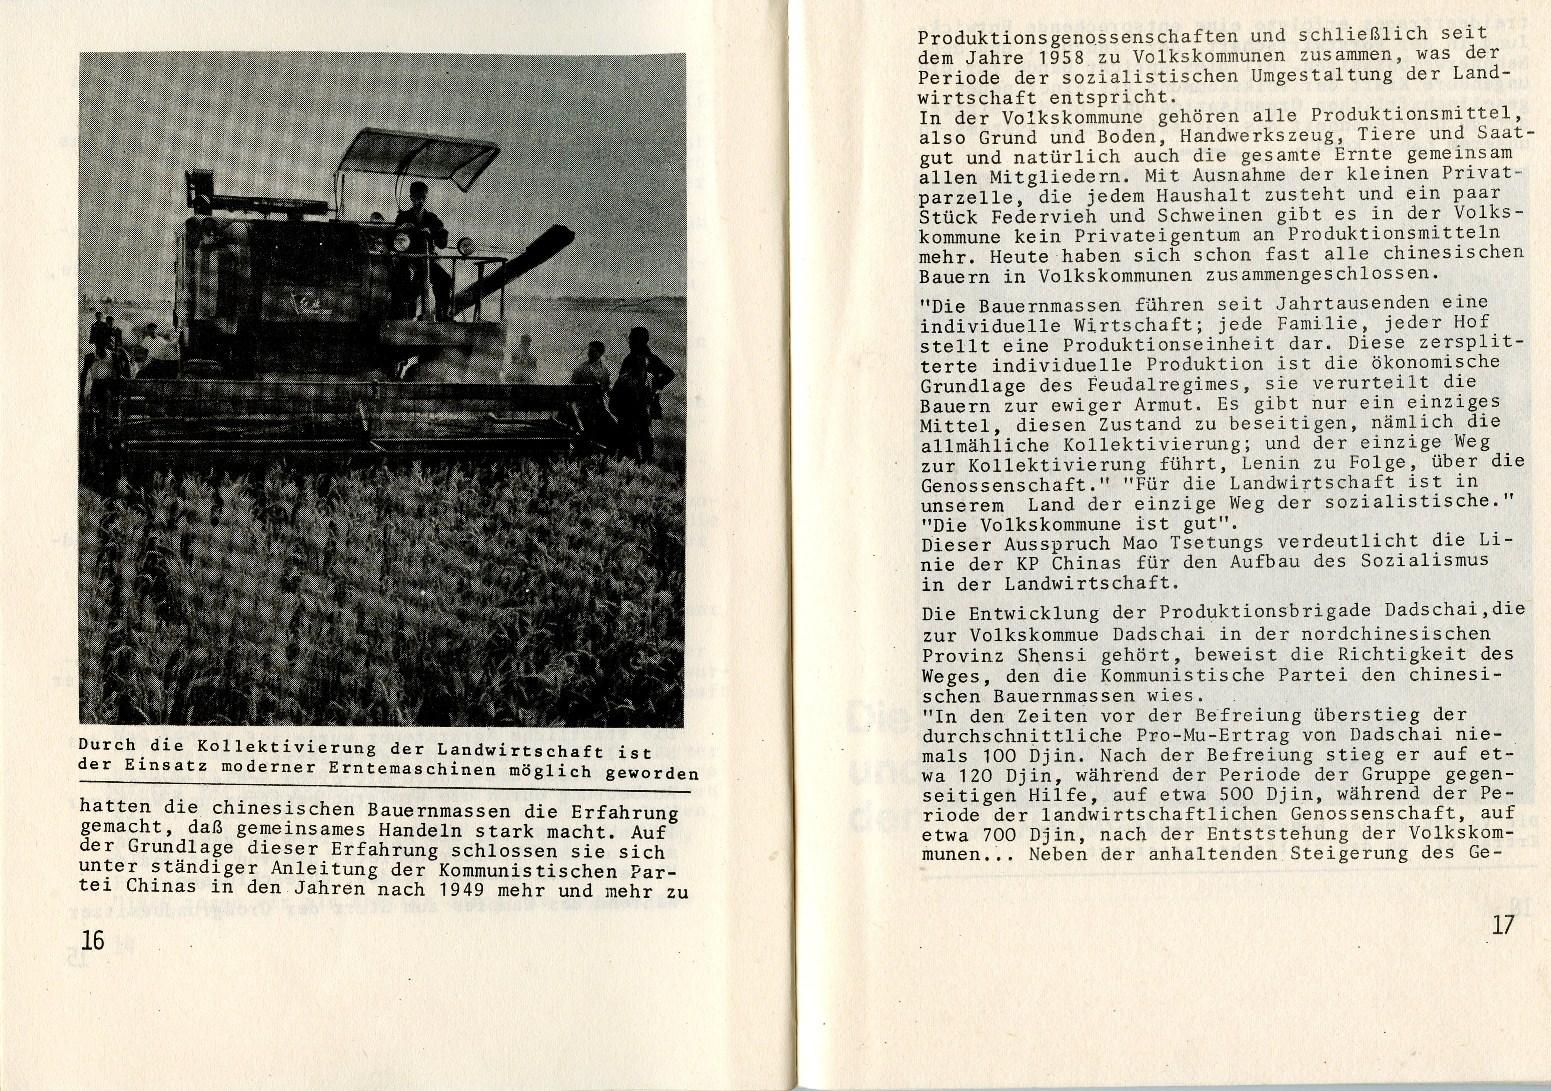 ZB_KPChinas_1971_10